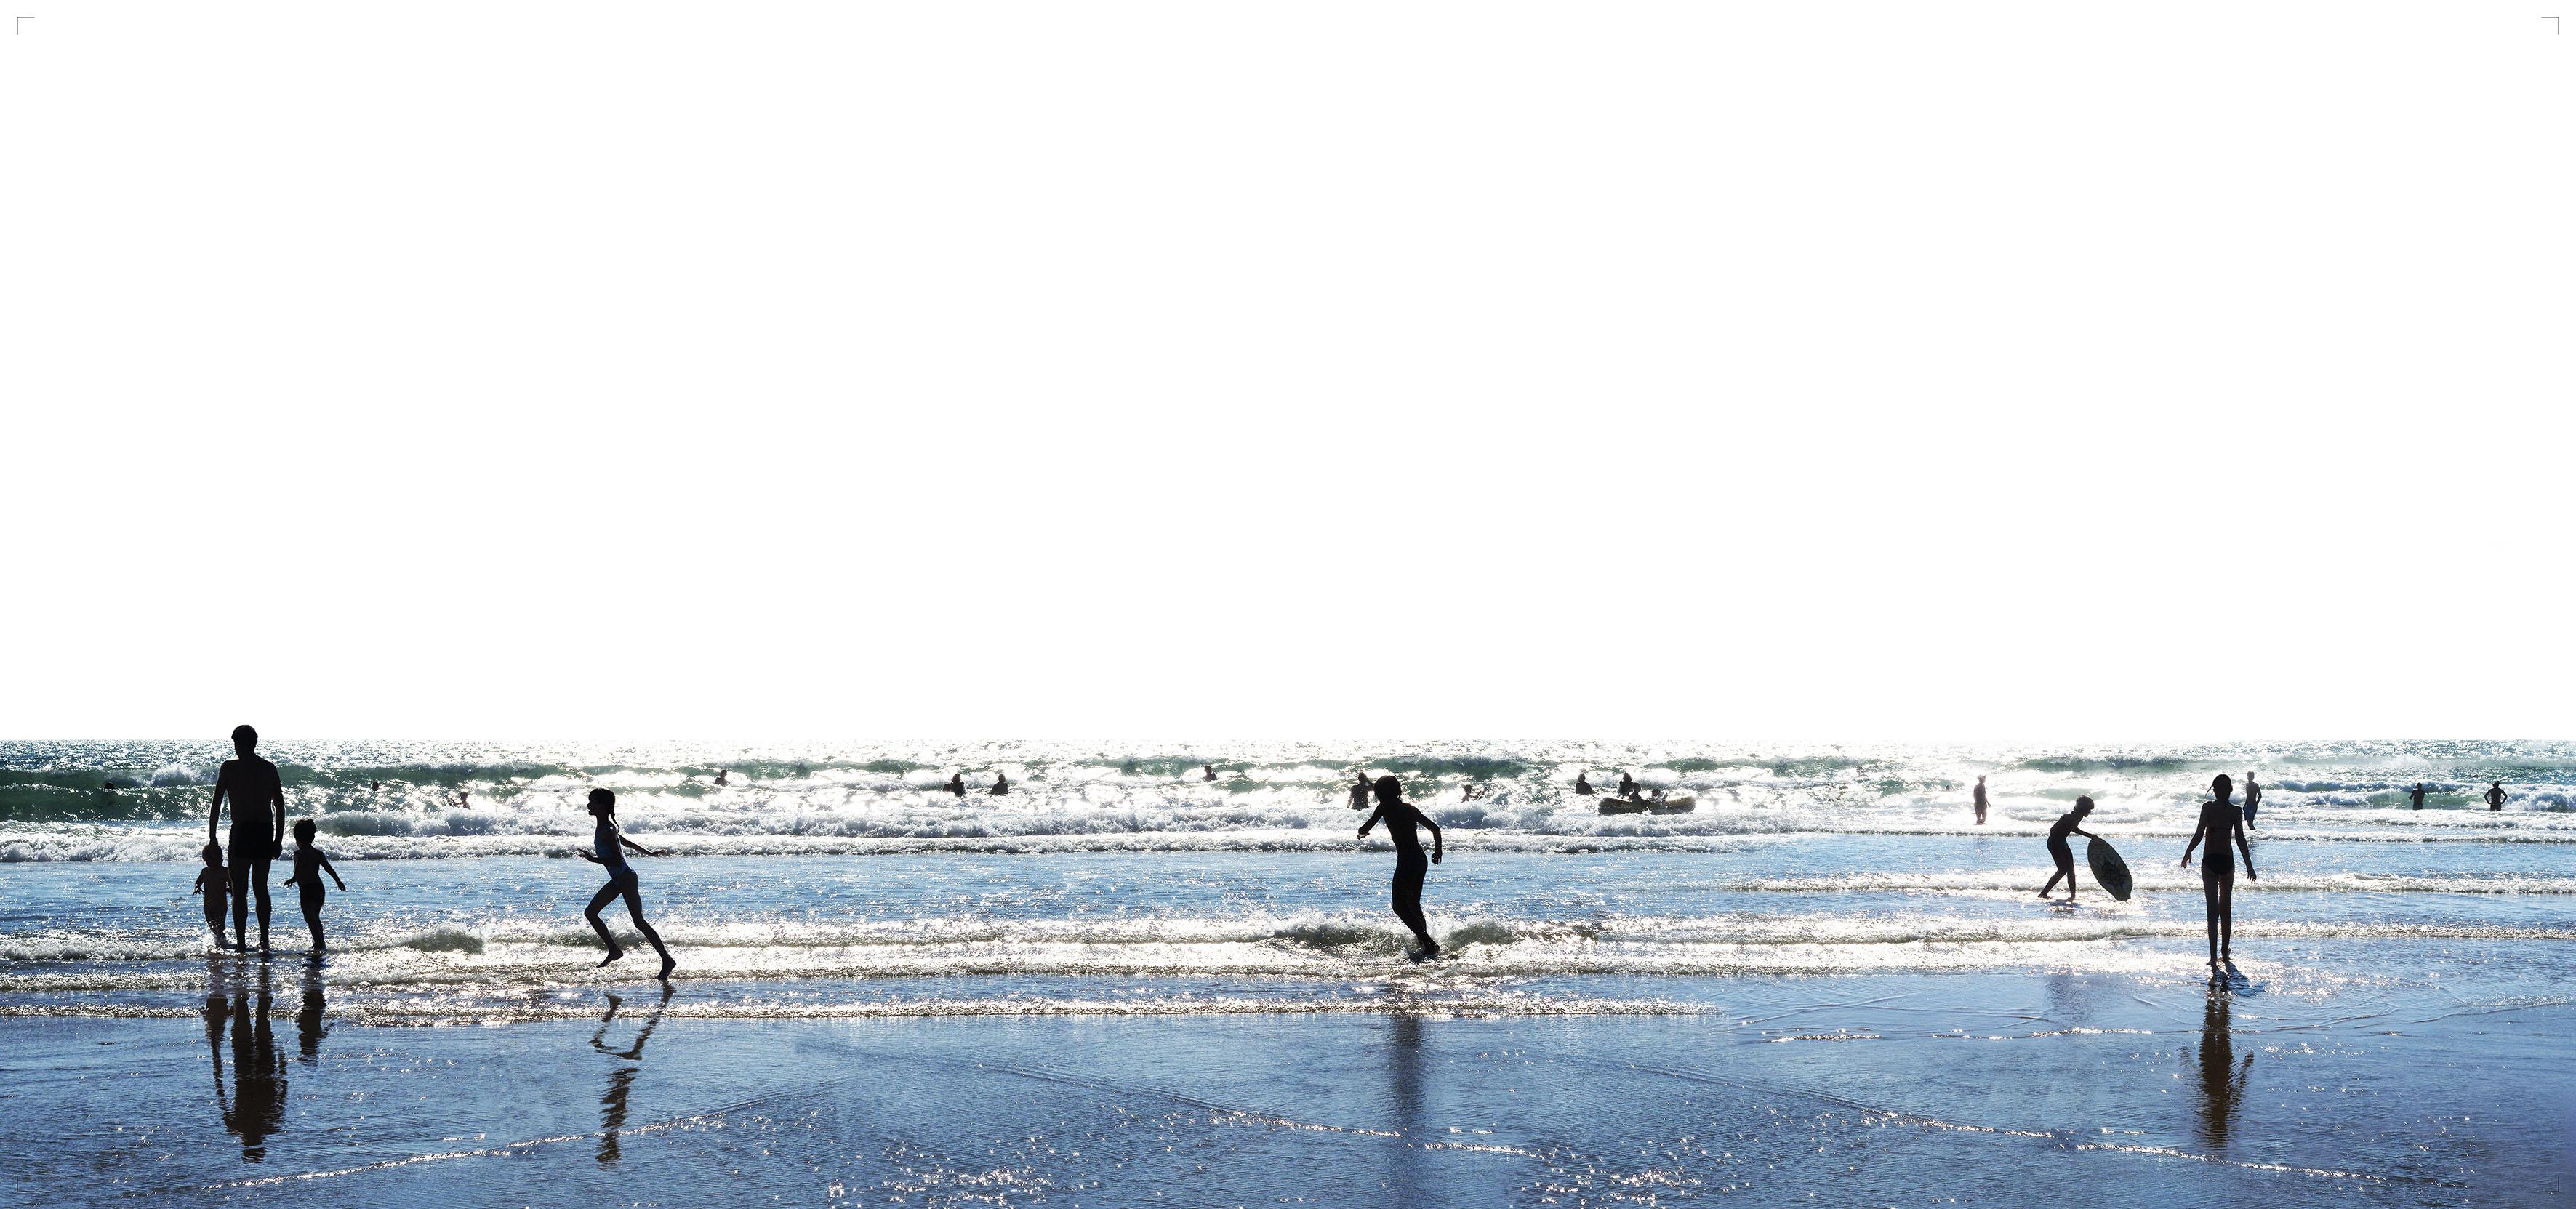 Plage 50 - 21st Century, Contemporary, Beach Landscape Photography